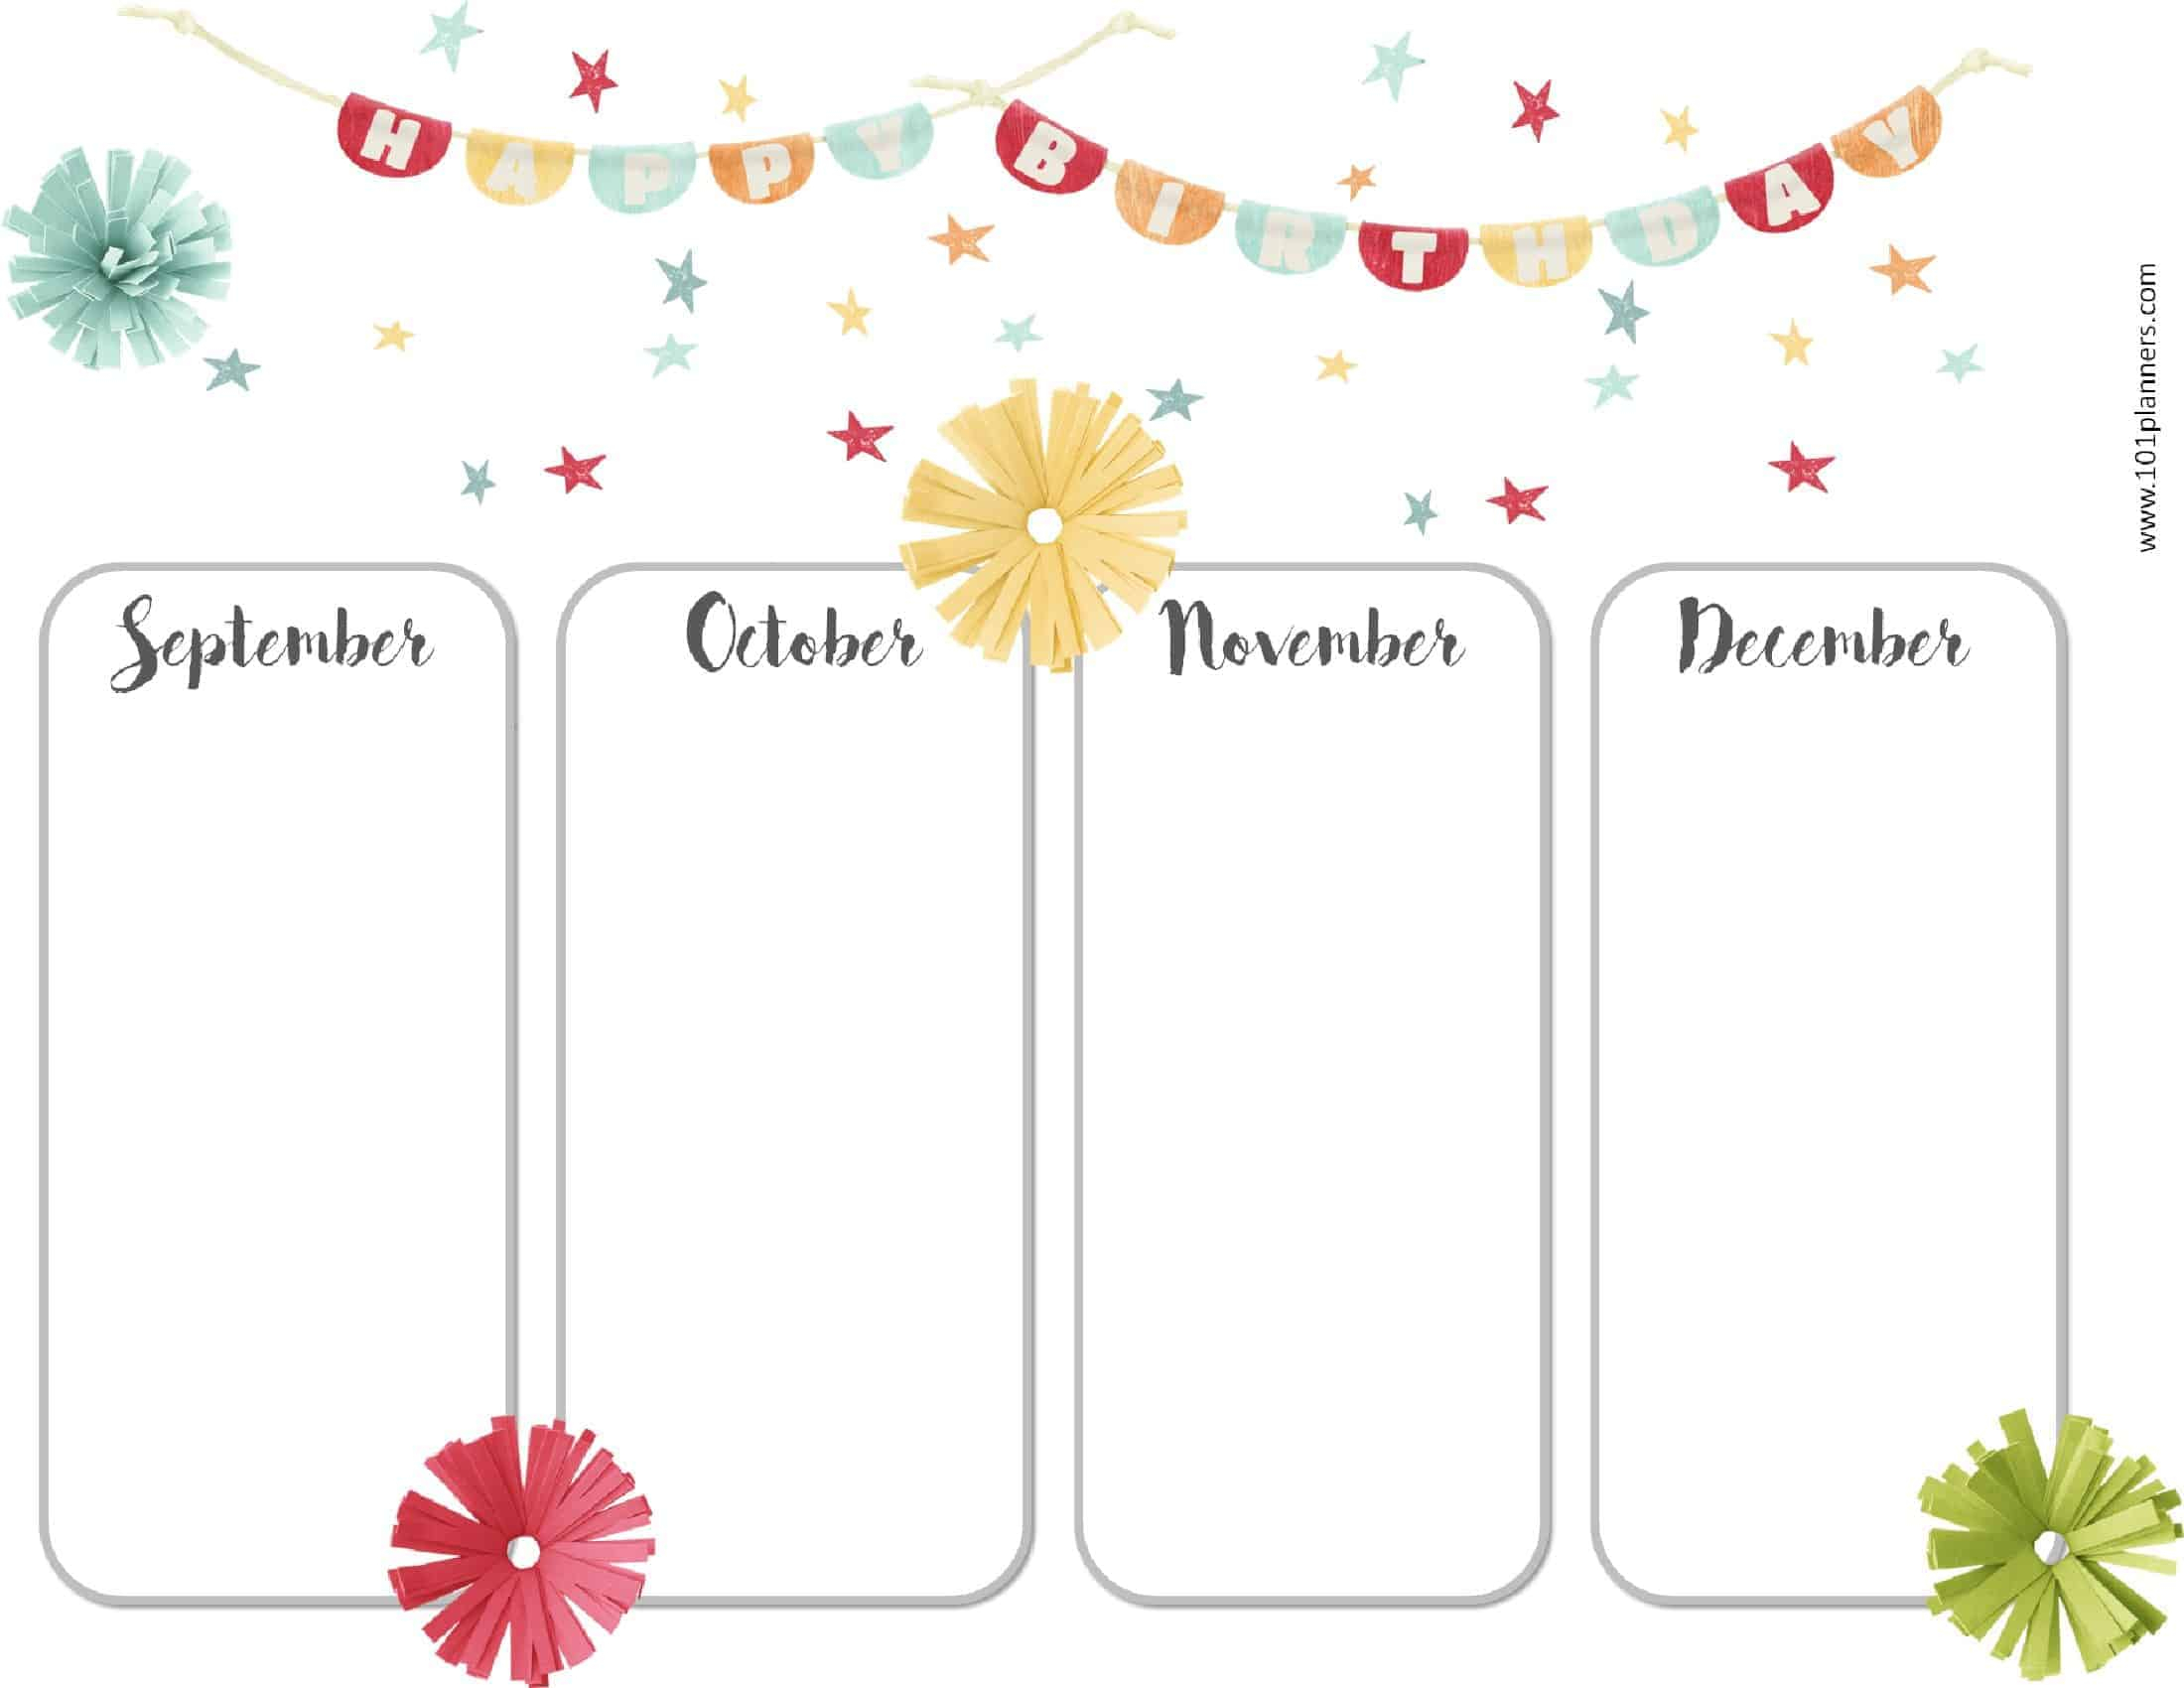 Free Calendar Template For Kindergarten | Free Resume with regard to Classroom Birthday Calendar Template